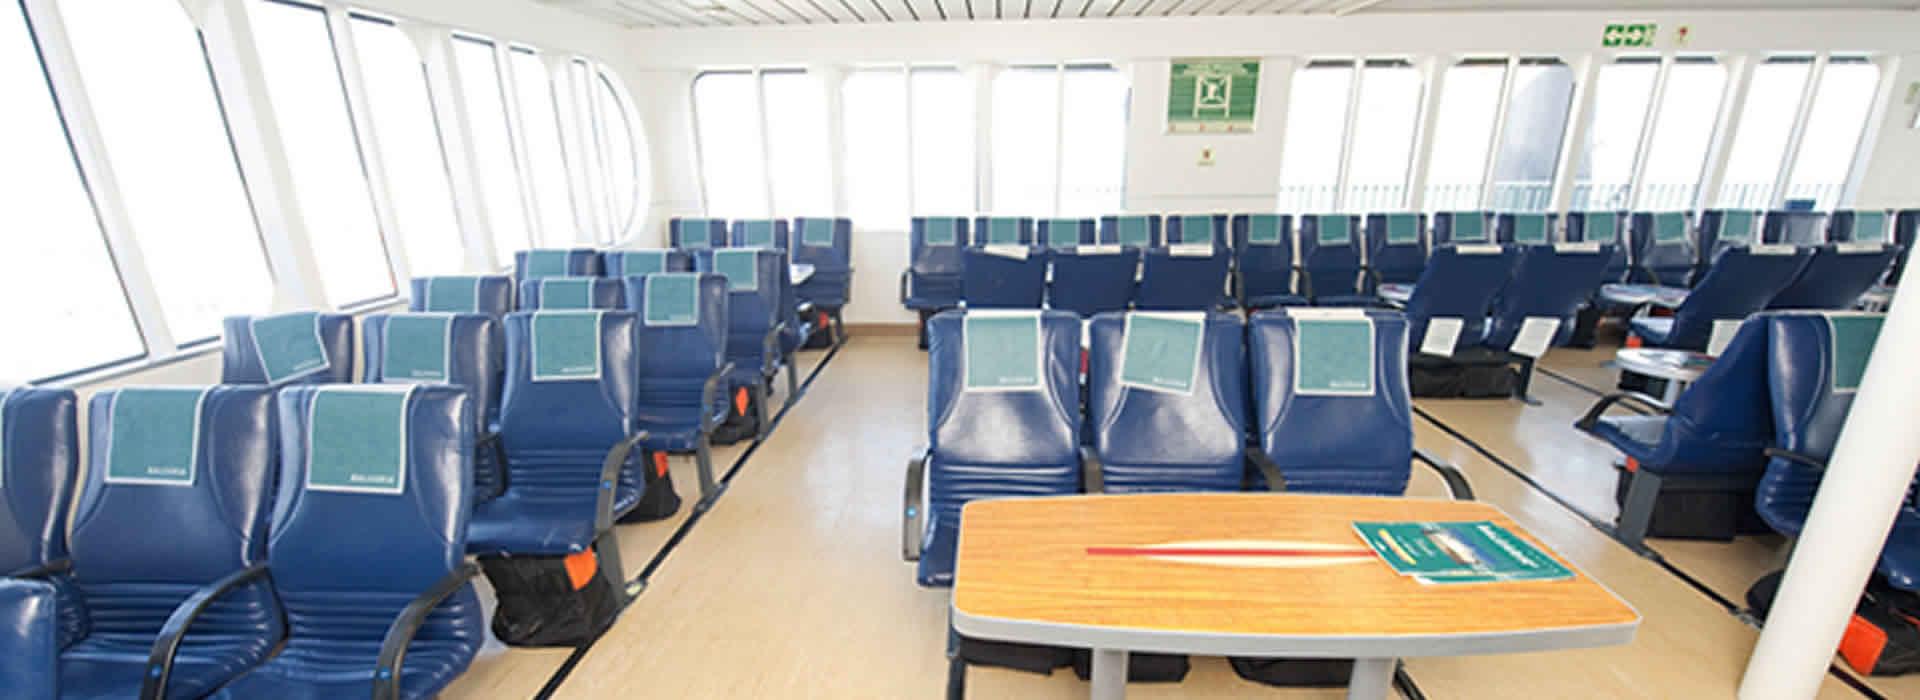 http://thegrandbahamas.com/wp-content/uploads/2016/07/3-night-cruise-grand-bahamas-seating.jpg